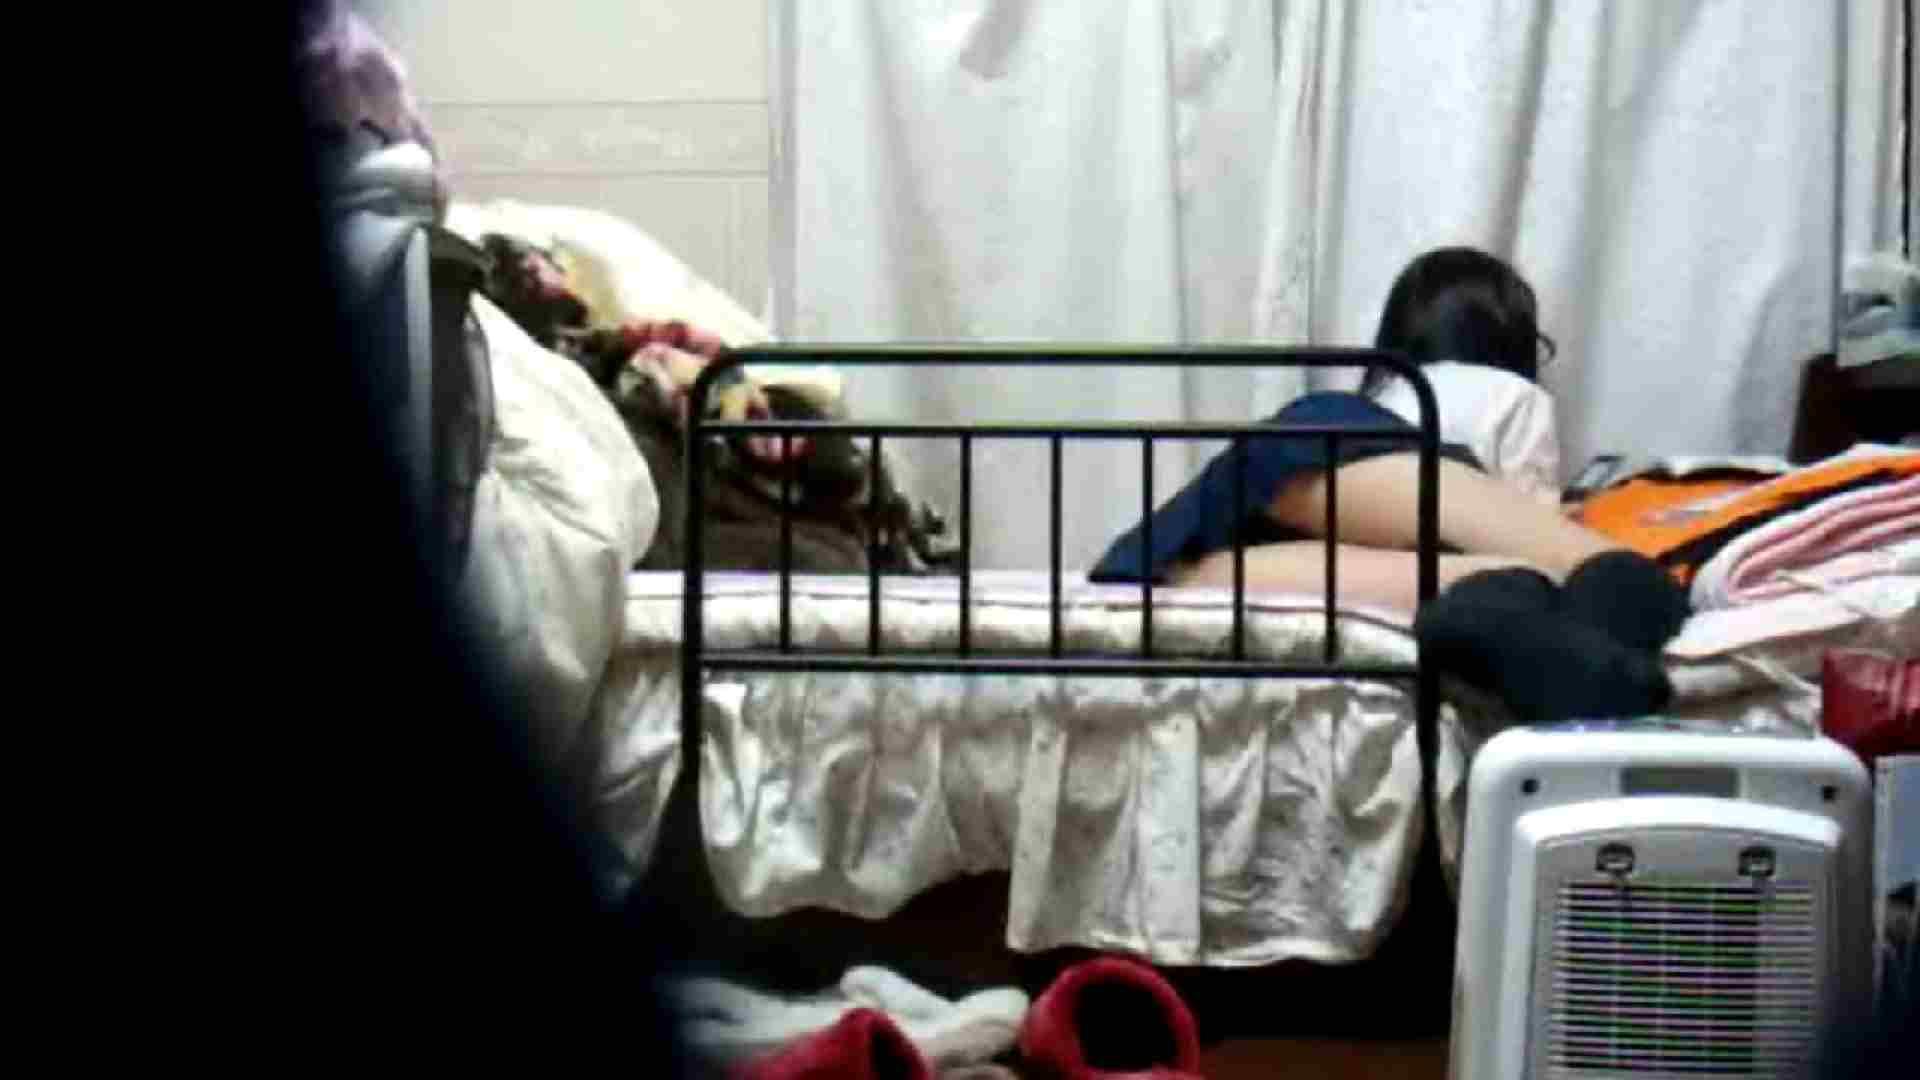 vol.4 まどかの帰宅後の部屋、ベッドで何かが始まります。 ○族 ヌード画像 100画像 27